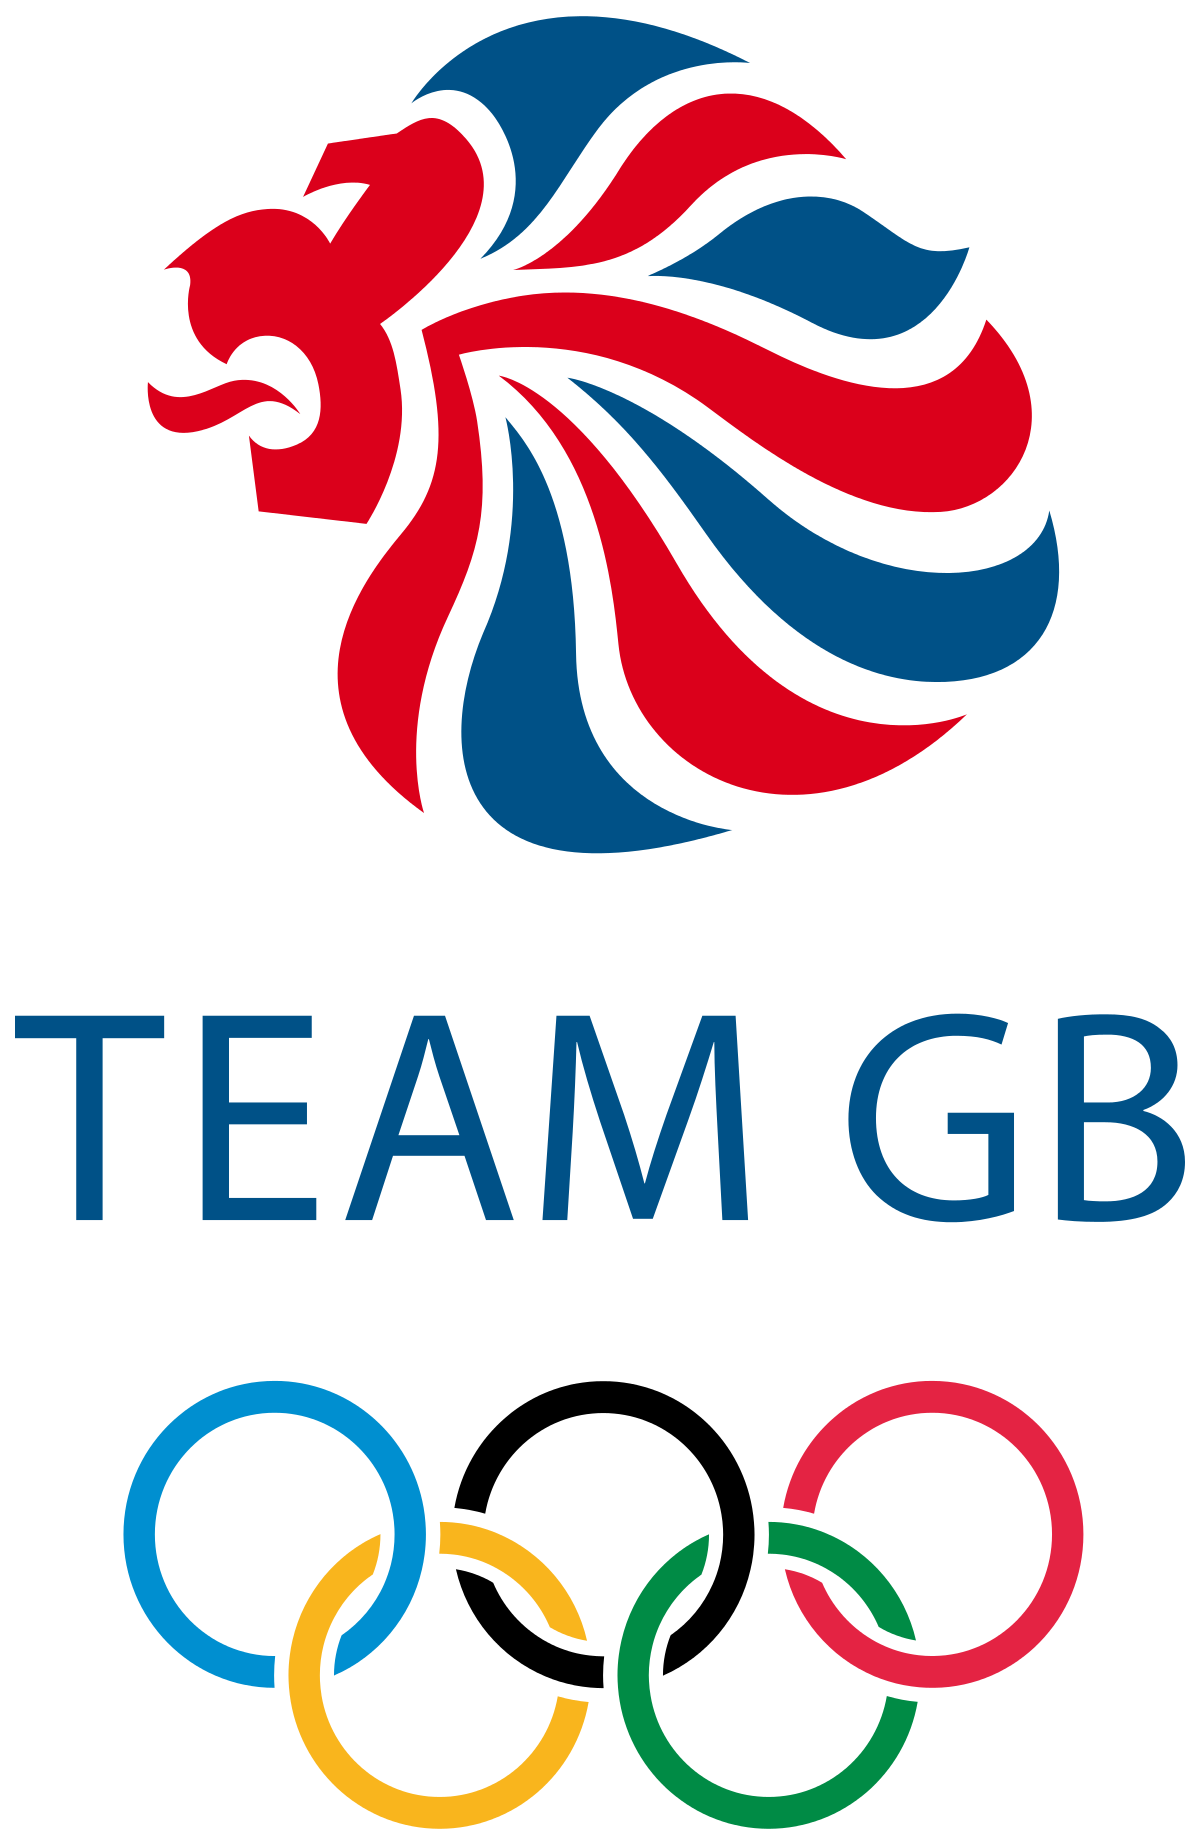 Programme TV Grande Bretagne